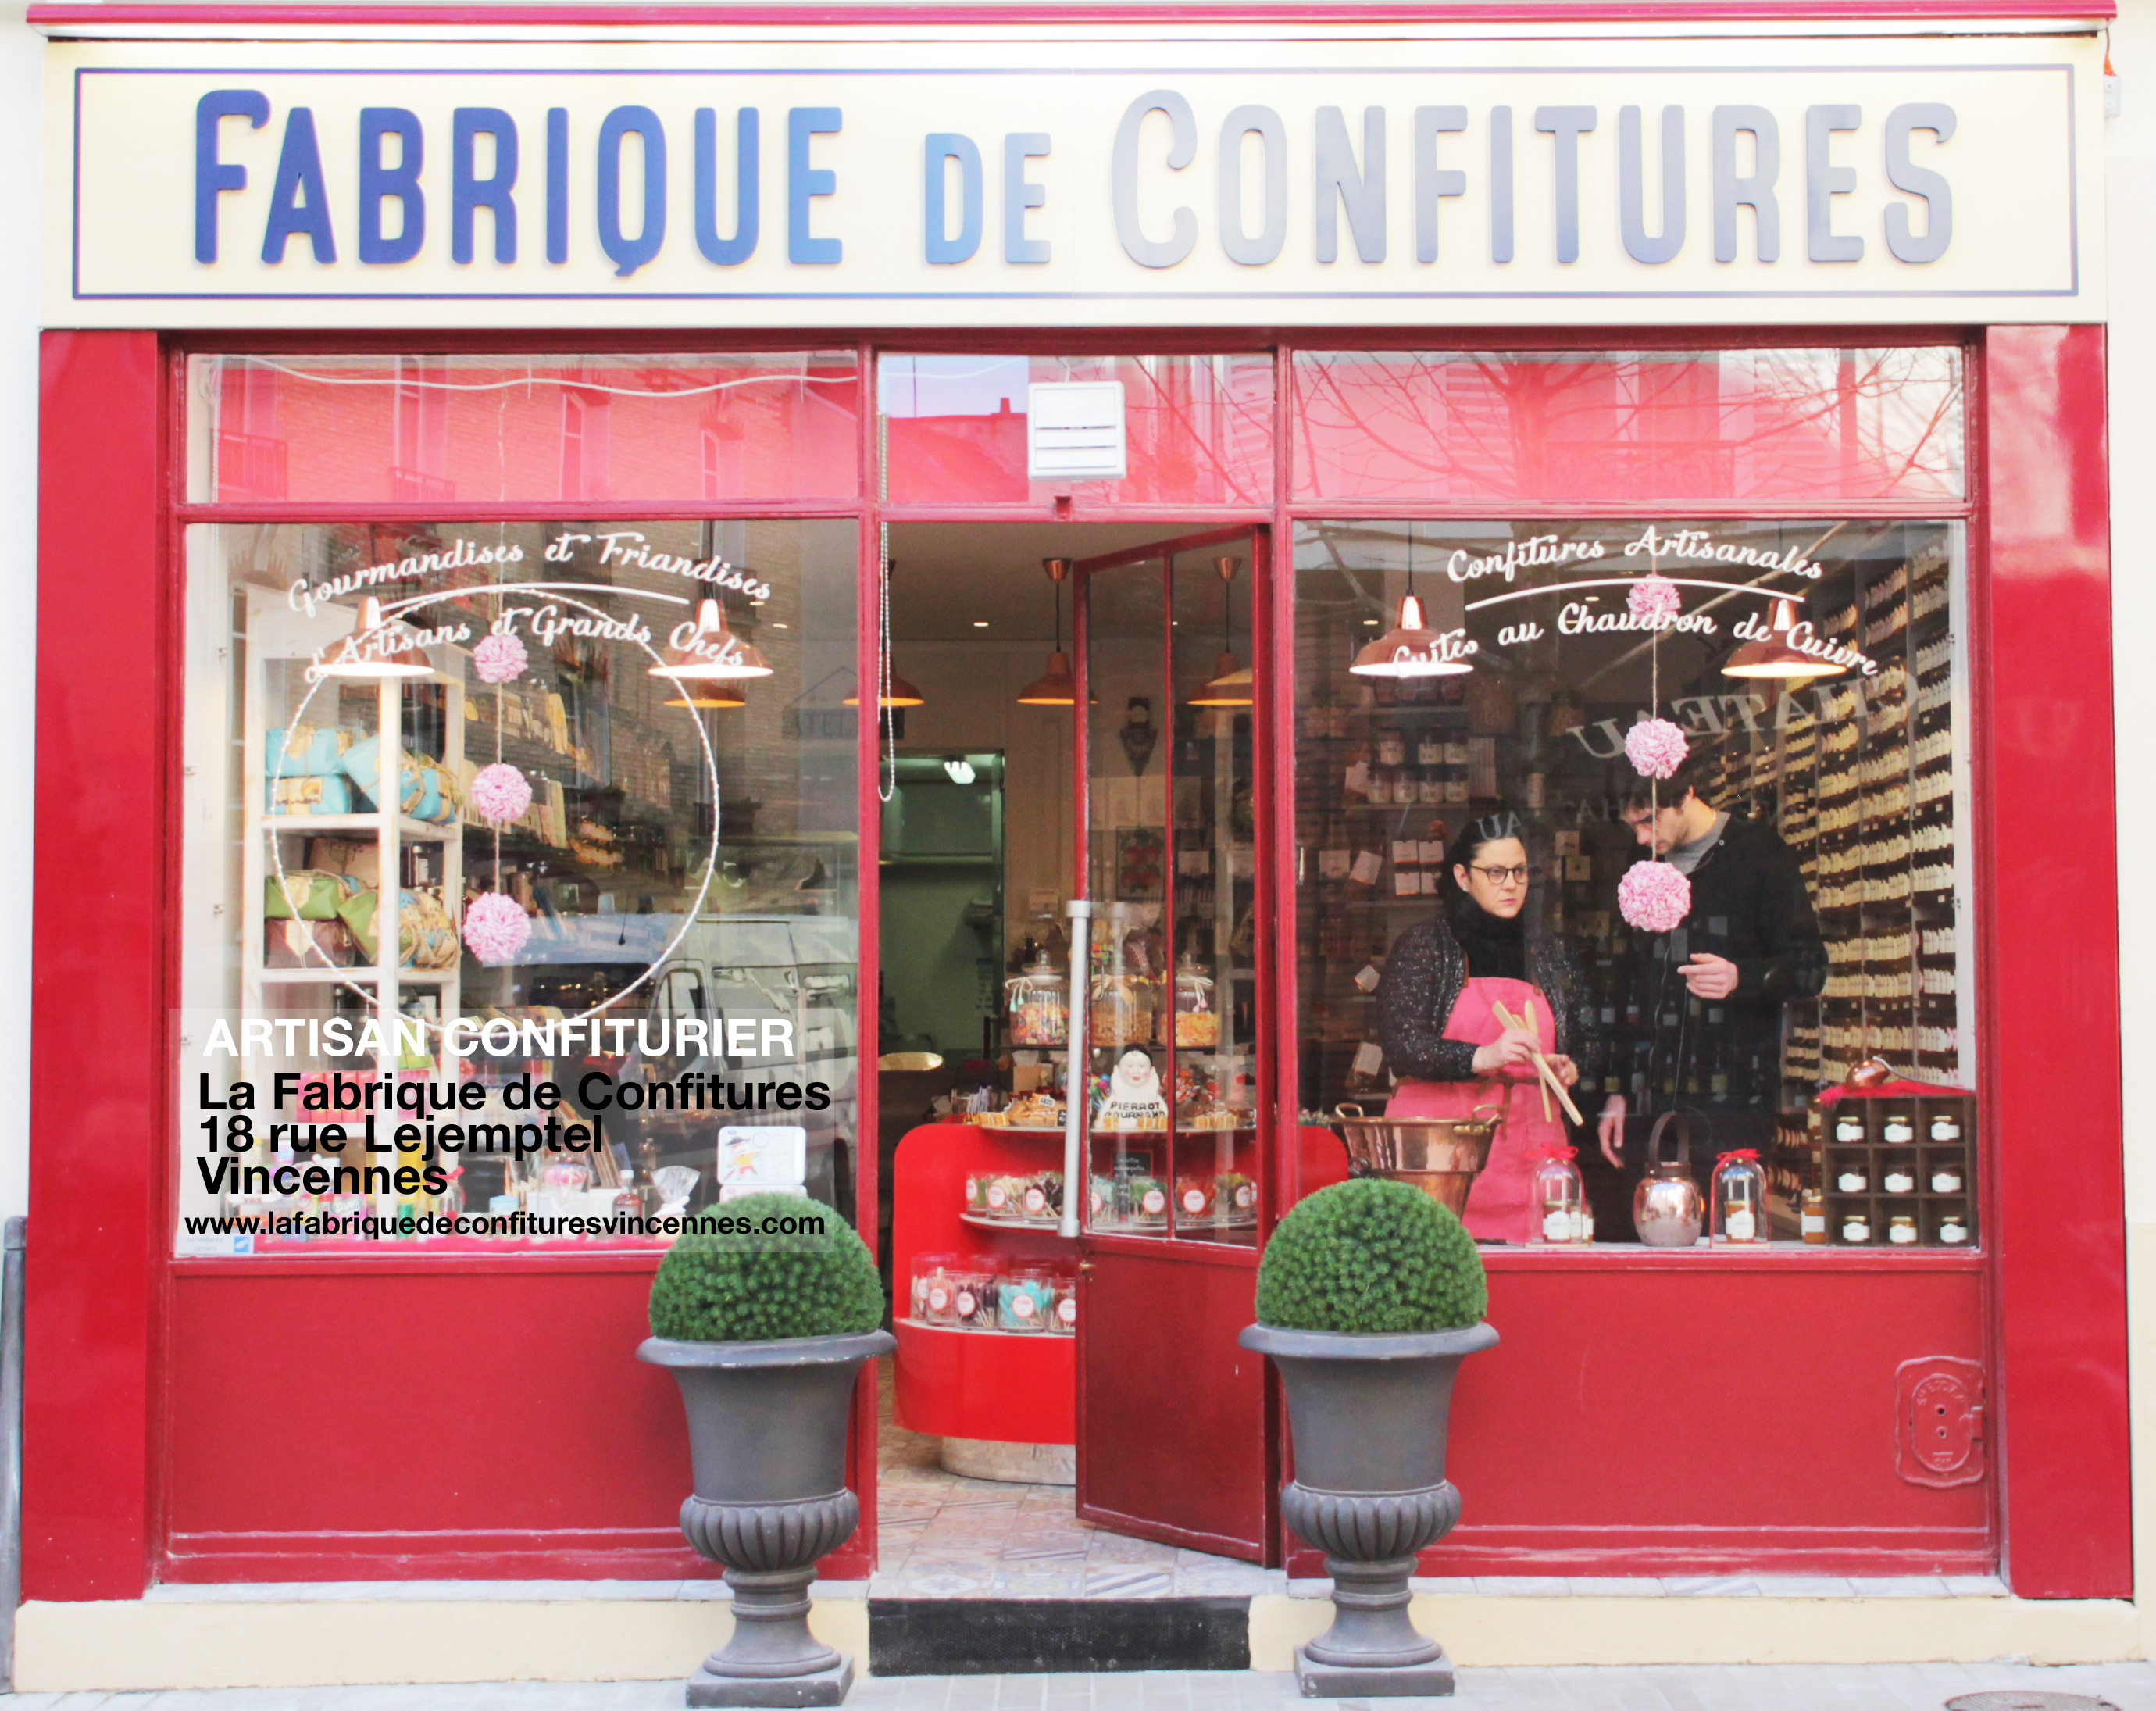 La façade de la Fabrique de confitures